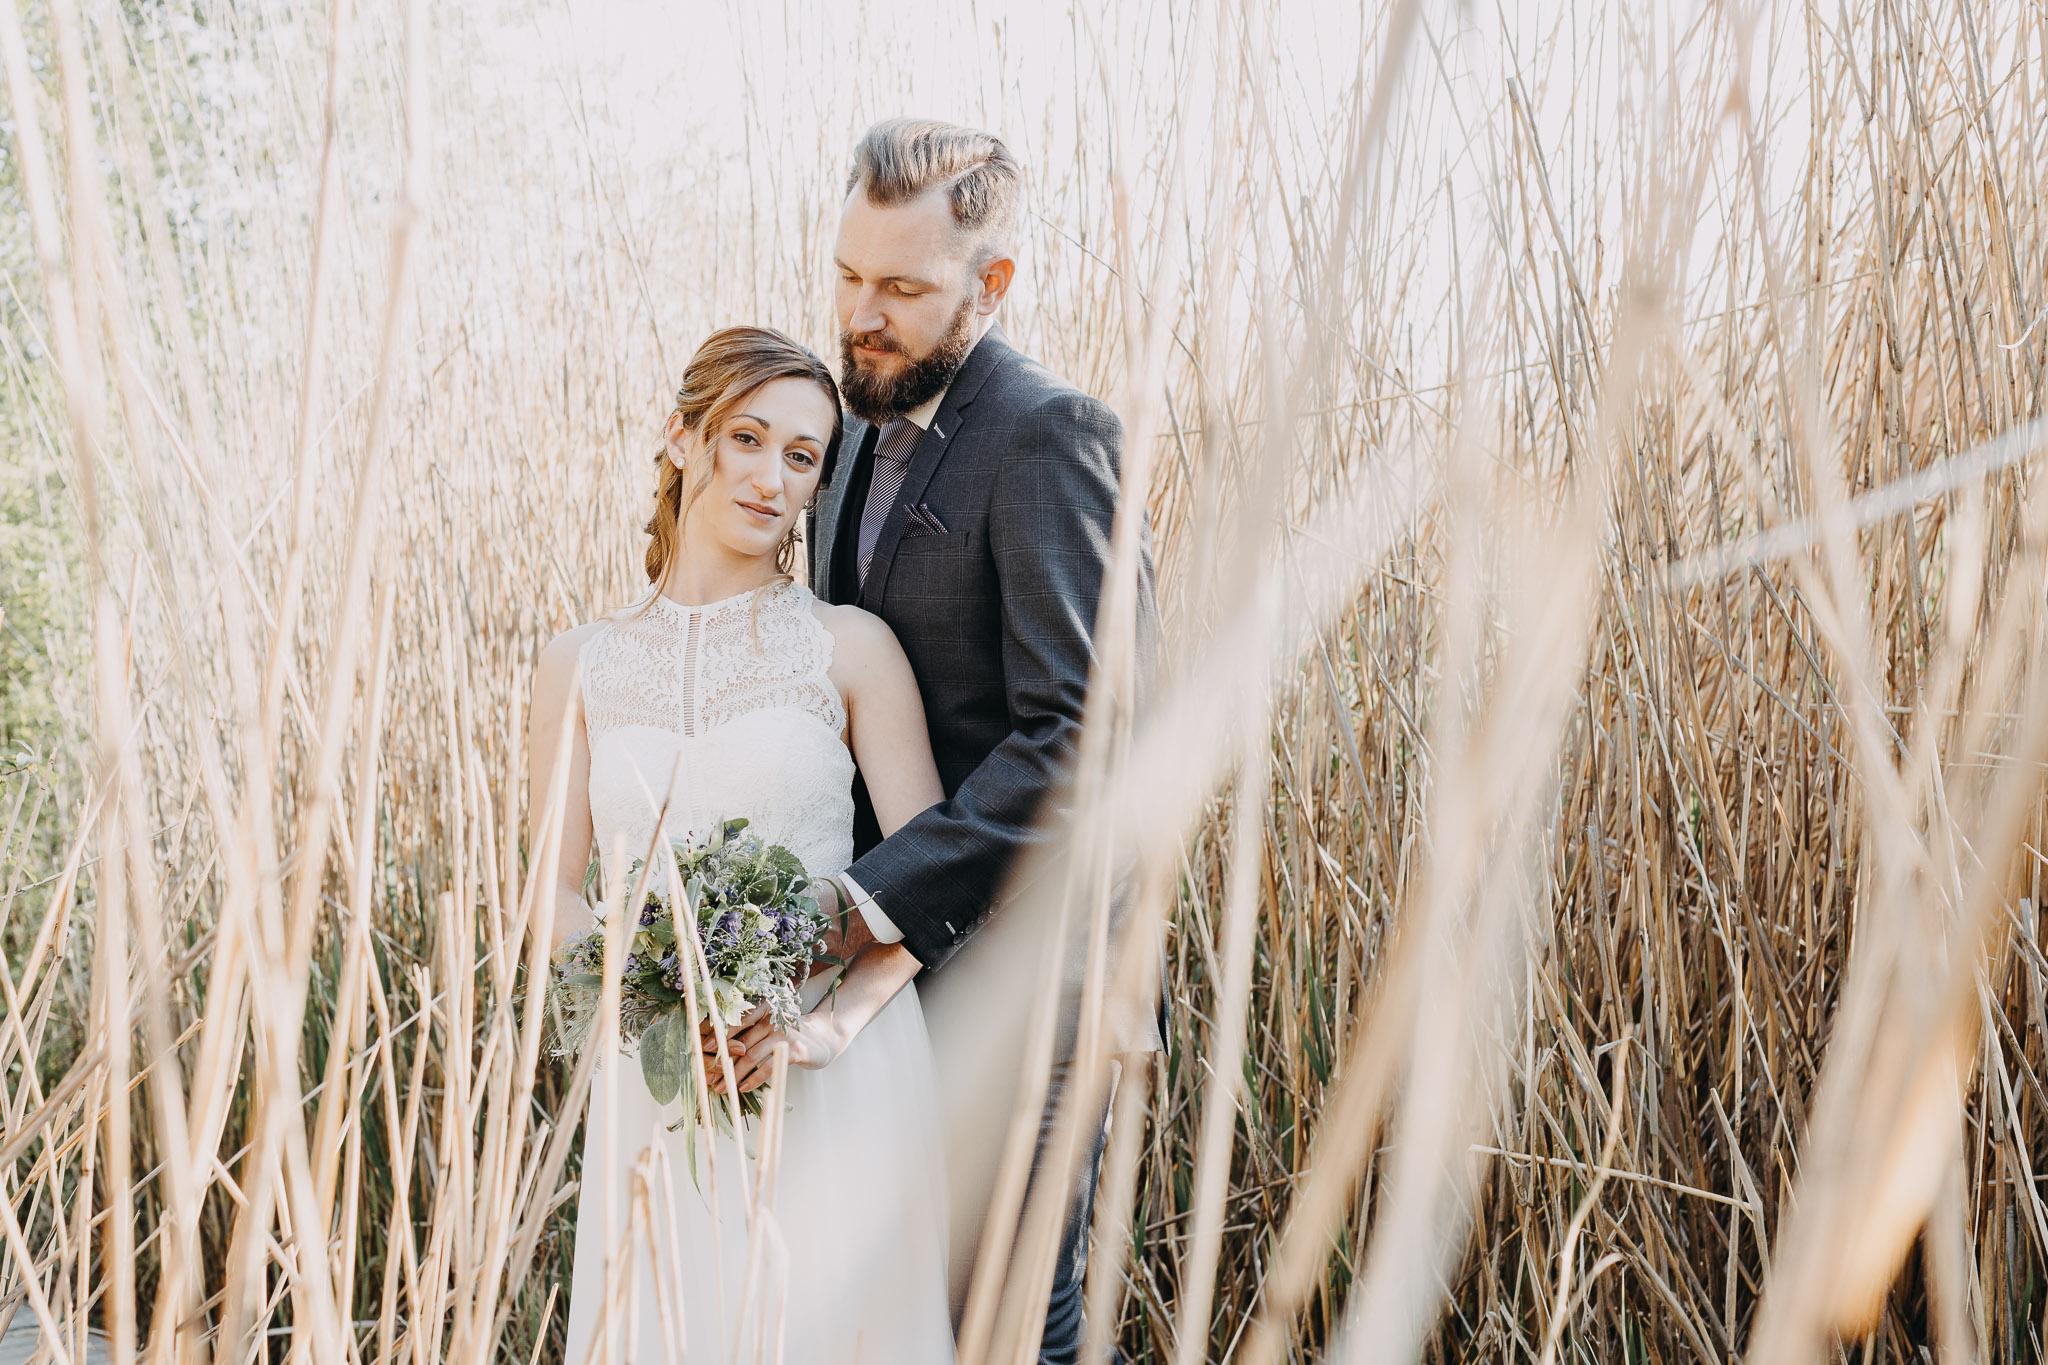 kubousfoto_svatebni_fotograf_brno_wedding_editorial